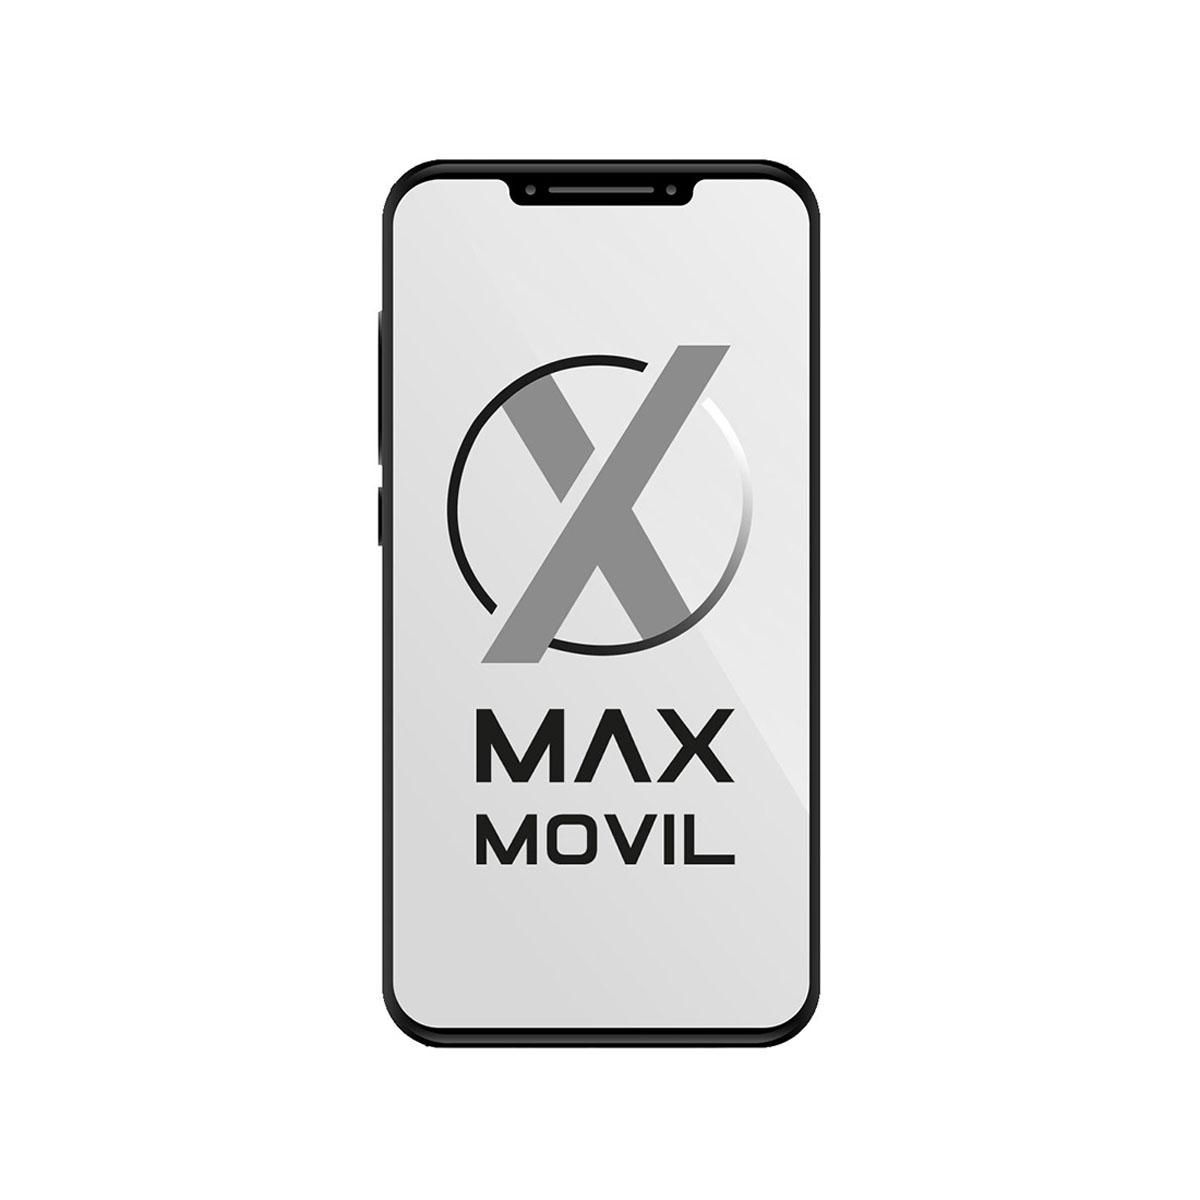 Cable de carga magnético para Apple Watch (1M) MKLG2ZM/A